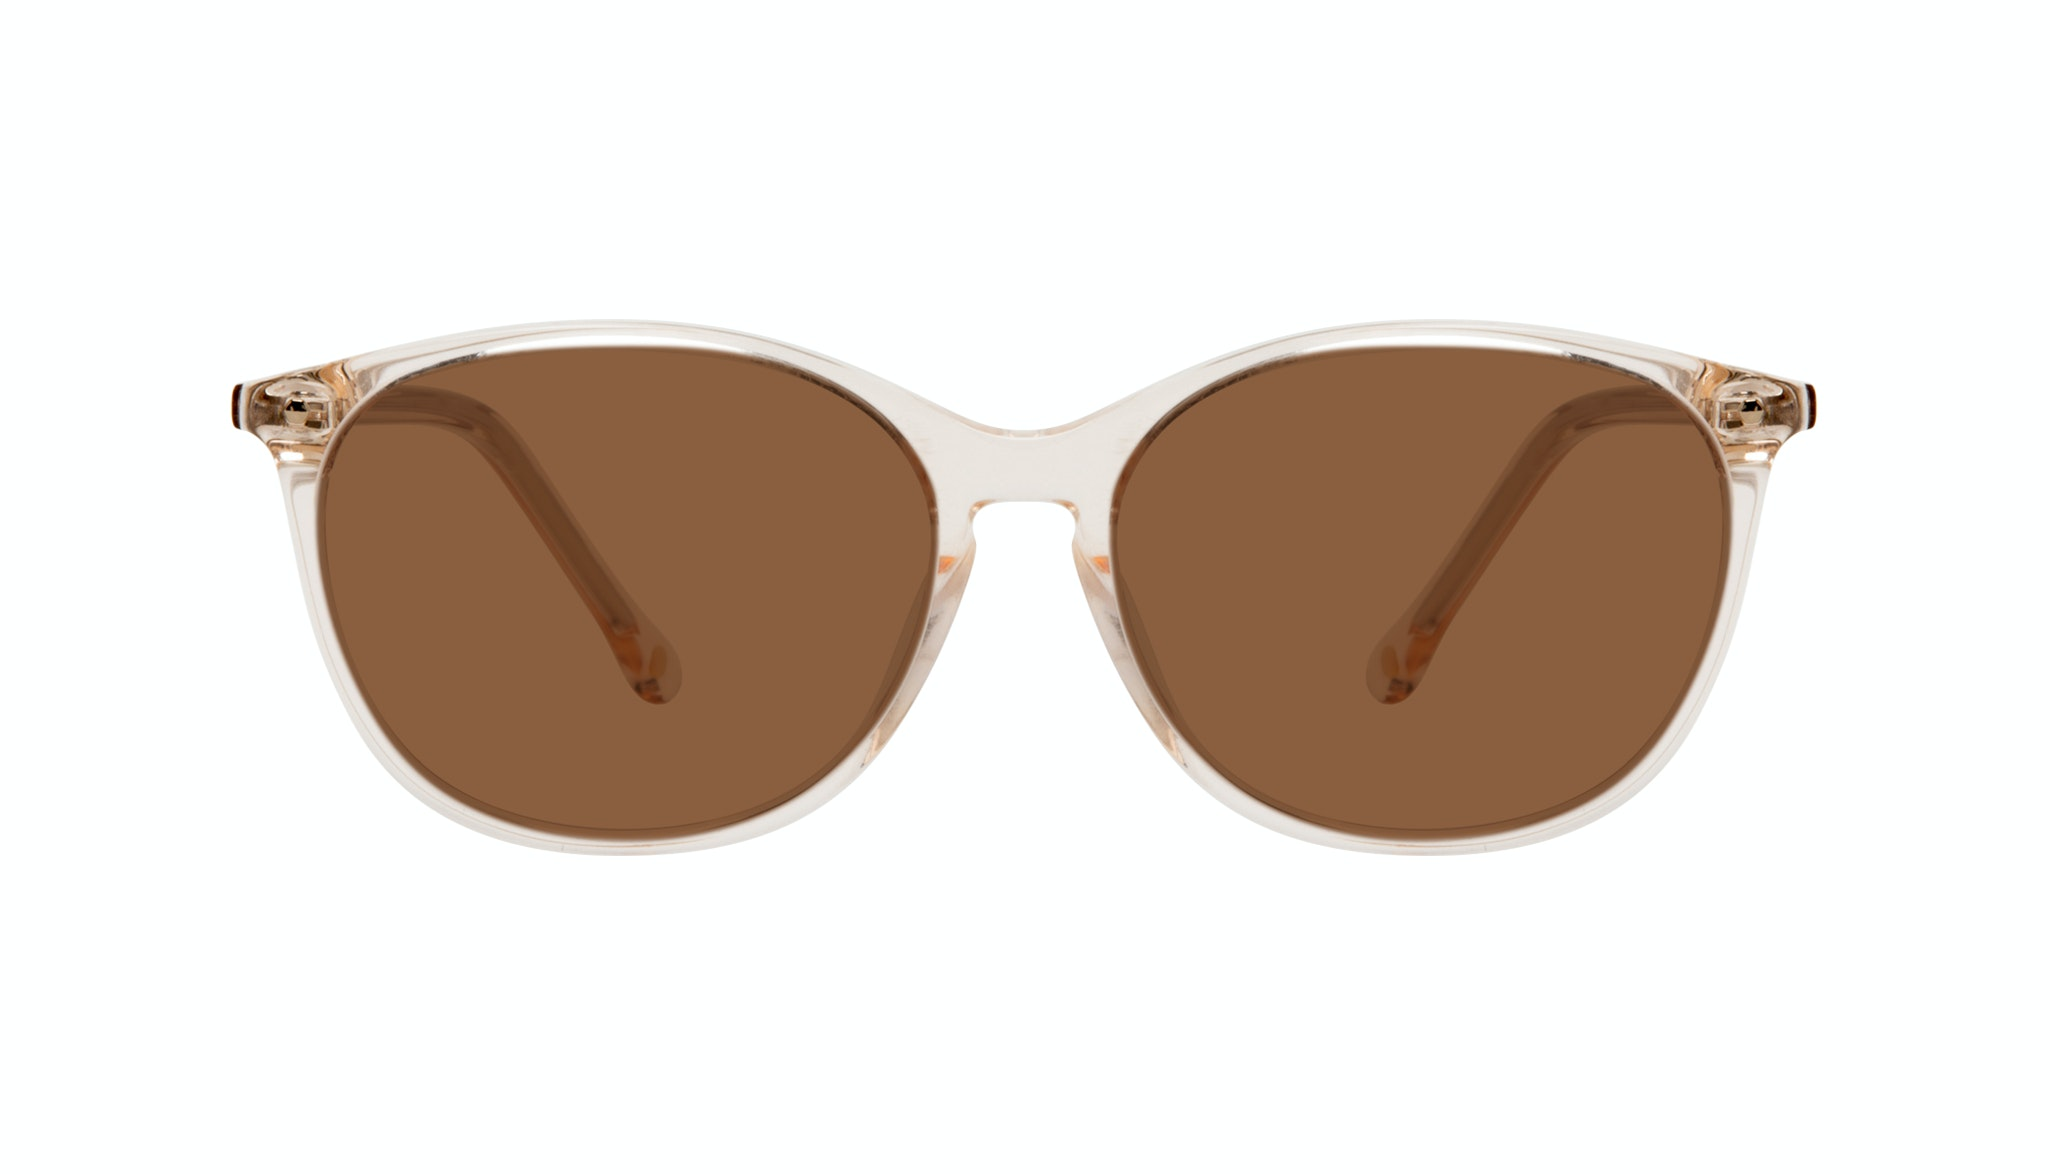 Affordable Fashion Glasses Rectangle Square Round Sunglasses Women Nadine Prosecco Front